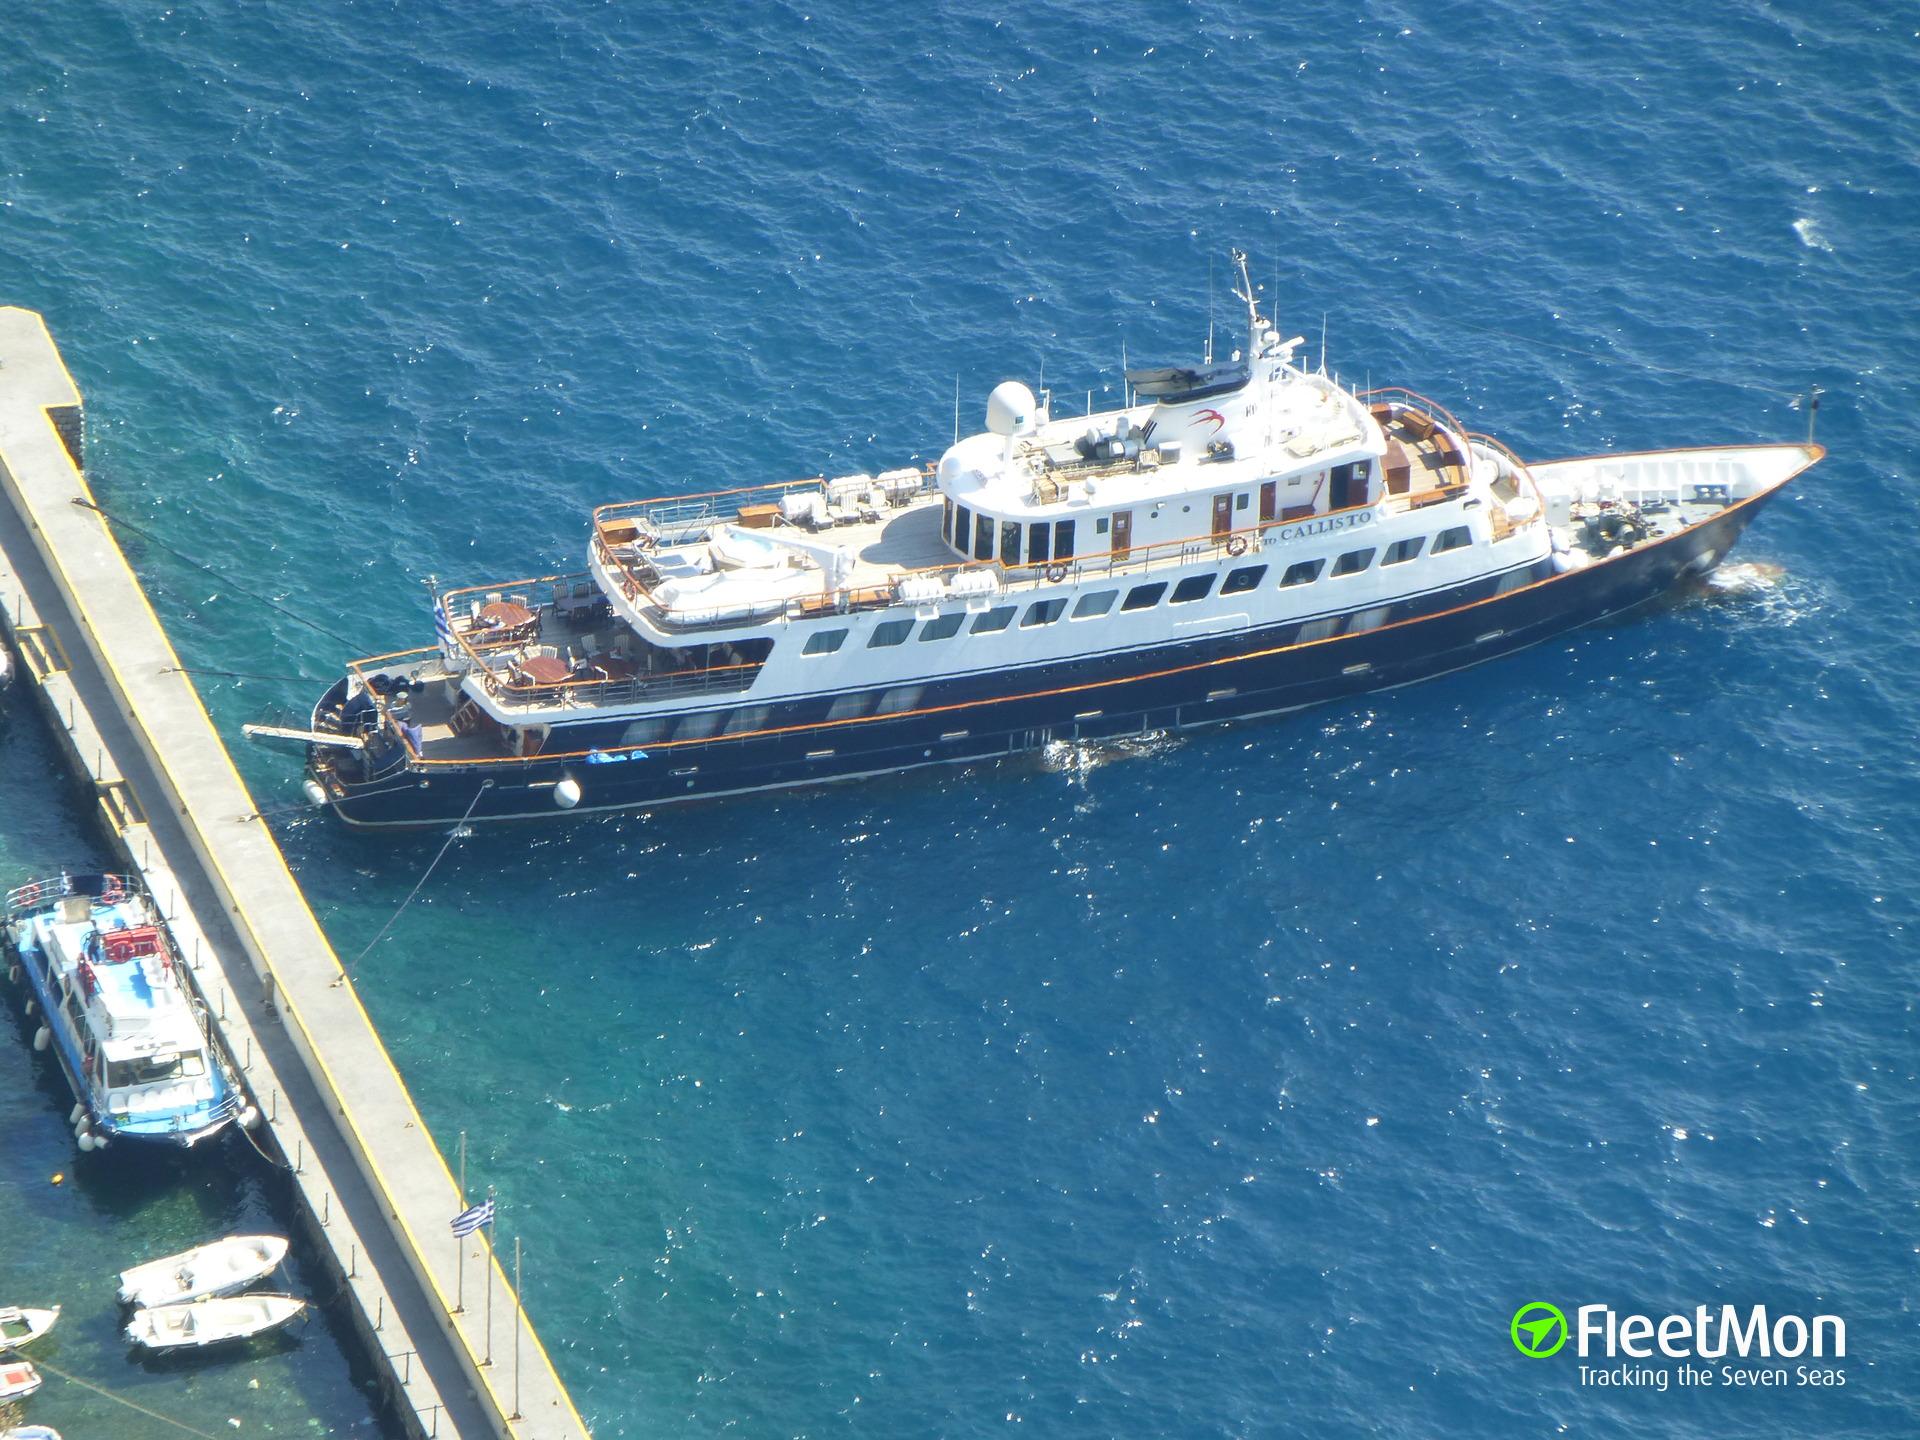 Passenger vessel TOCALLISTO allided with pleasure boats